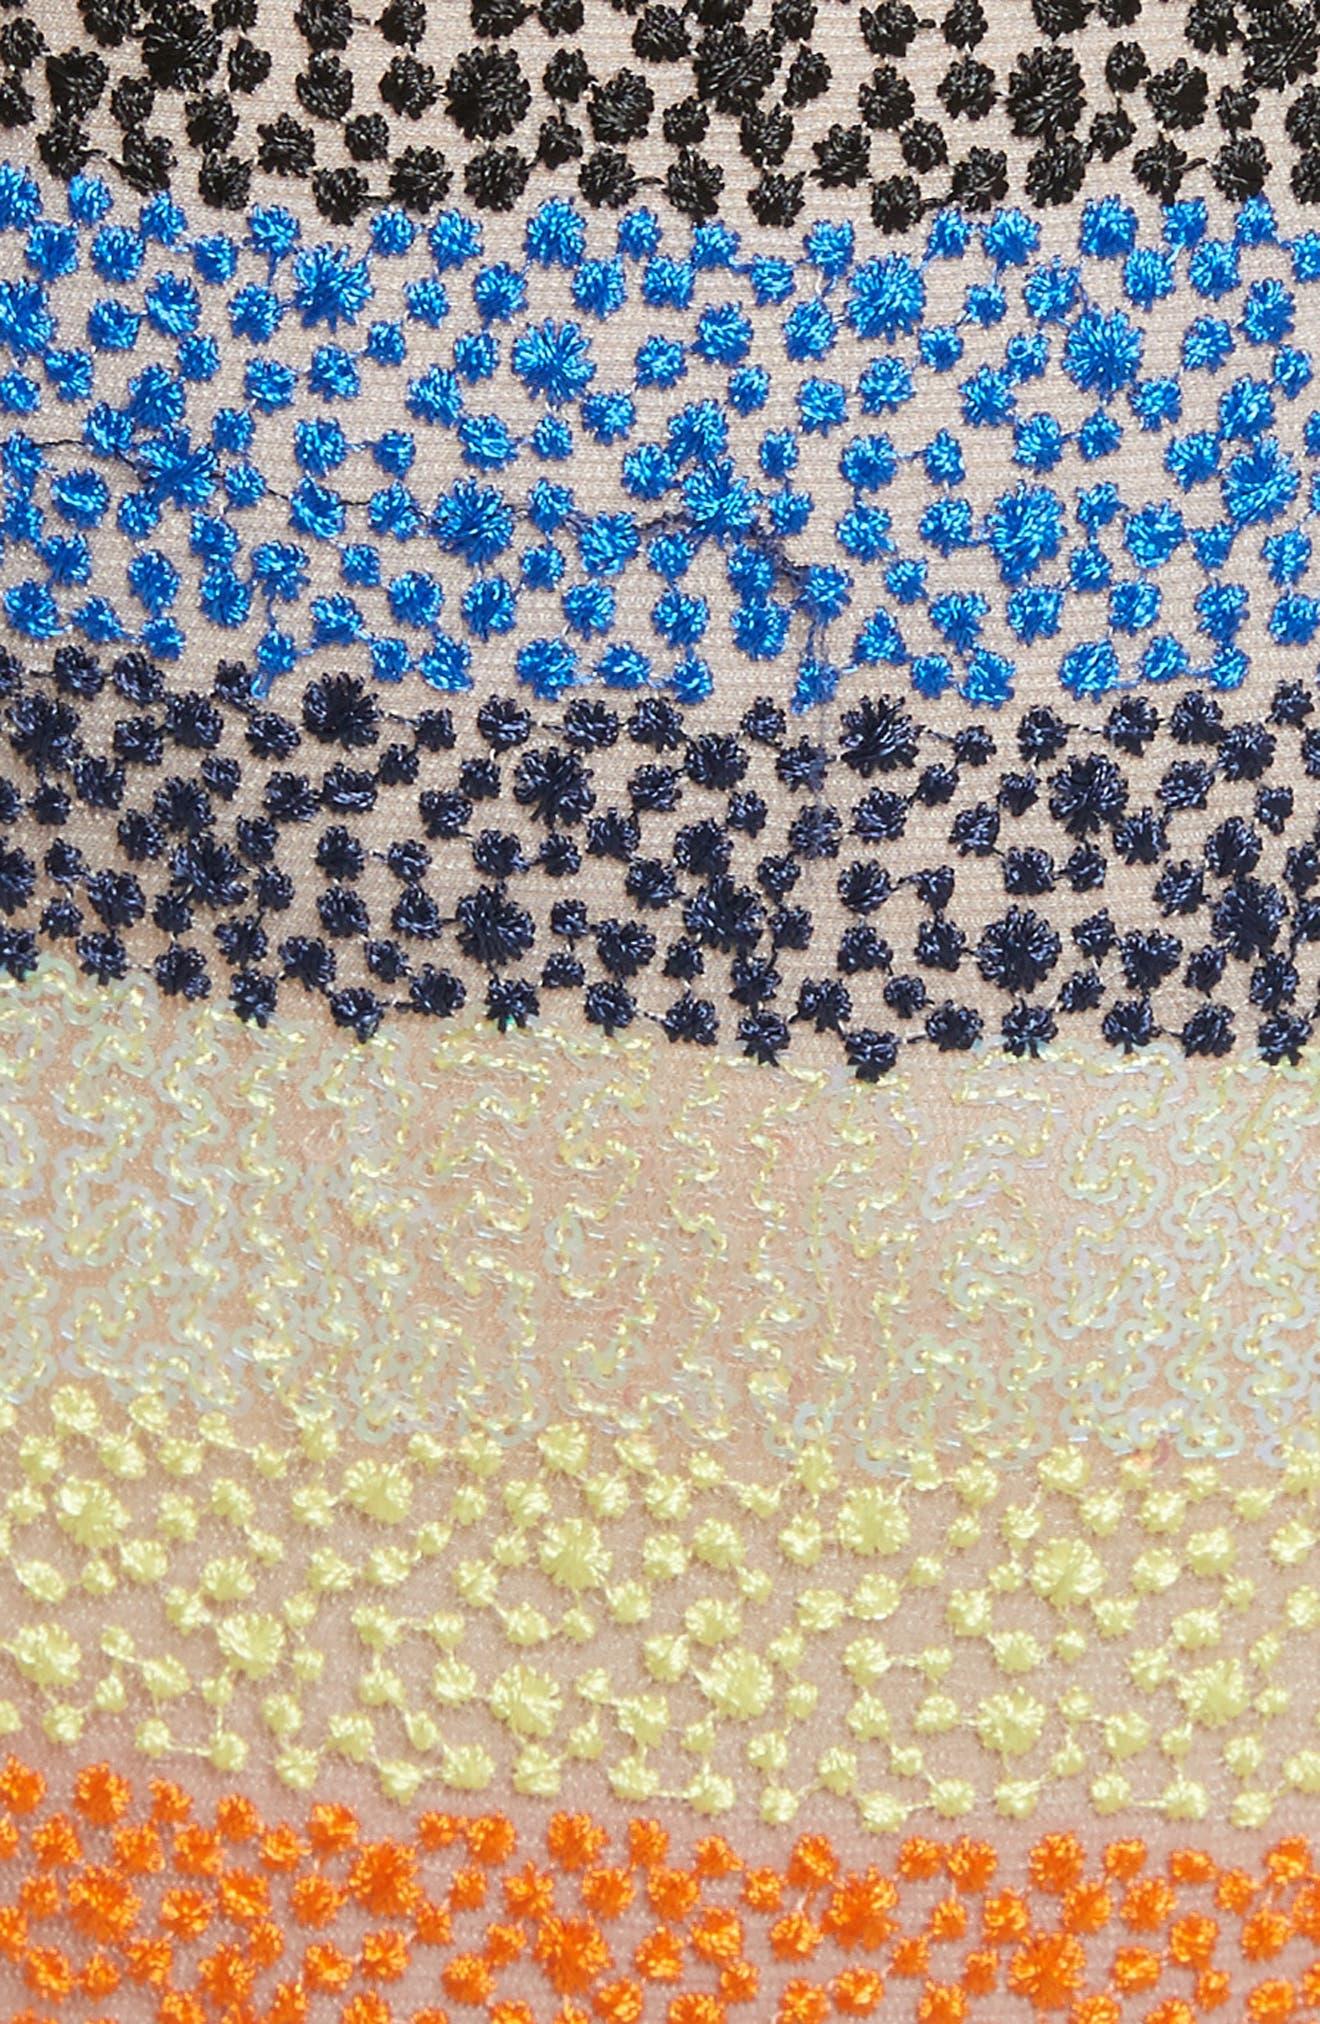 Annabeth Off the Shoulder Midi Dress,                             Alternate thumbnail 5, color,                             006